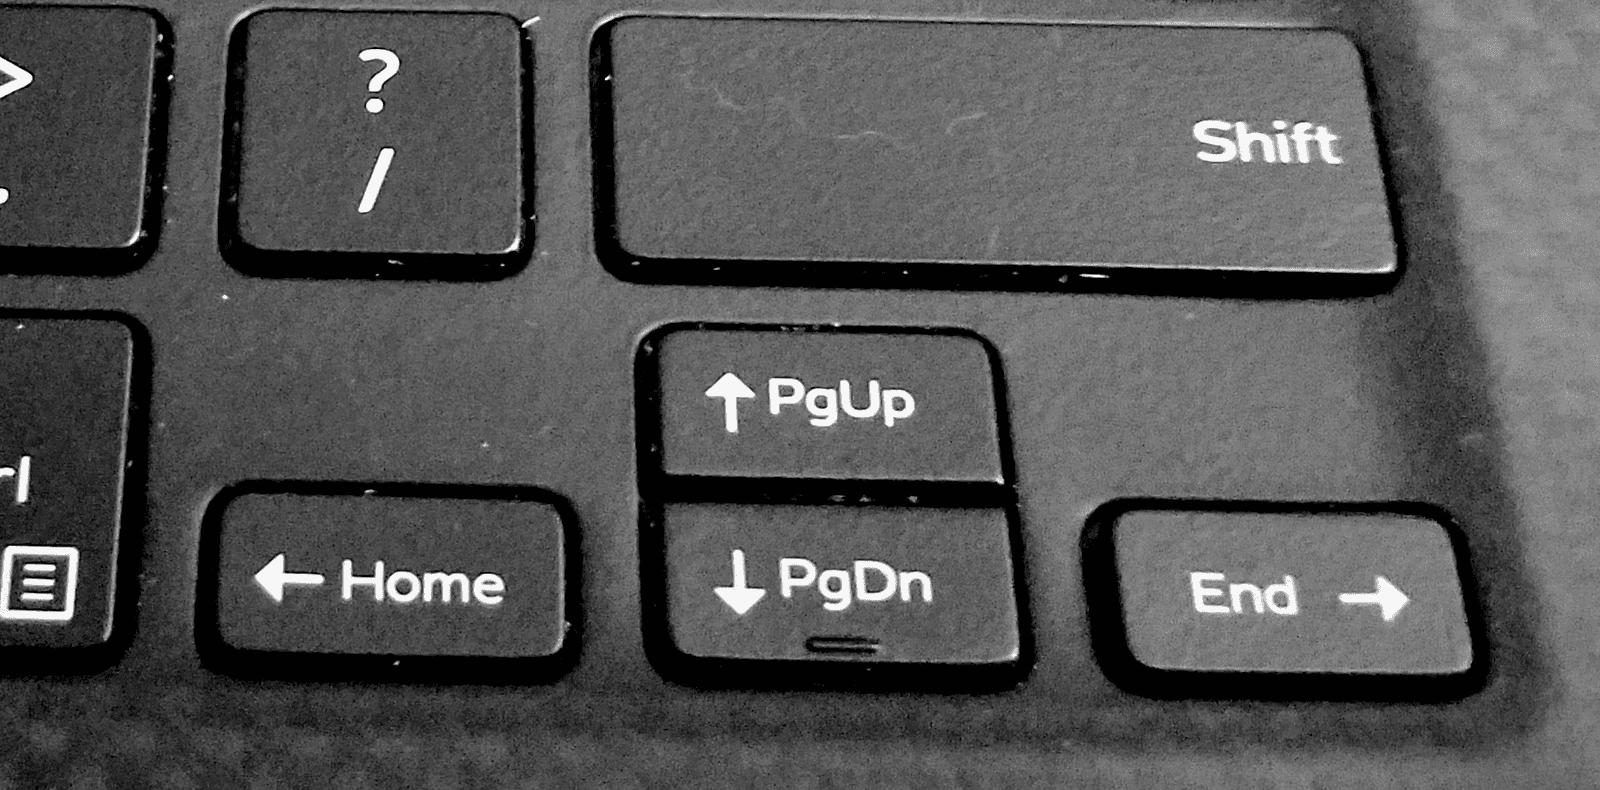 Dell XPS keyboard